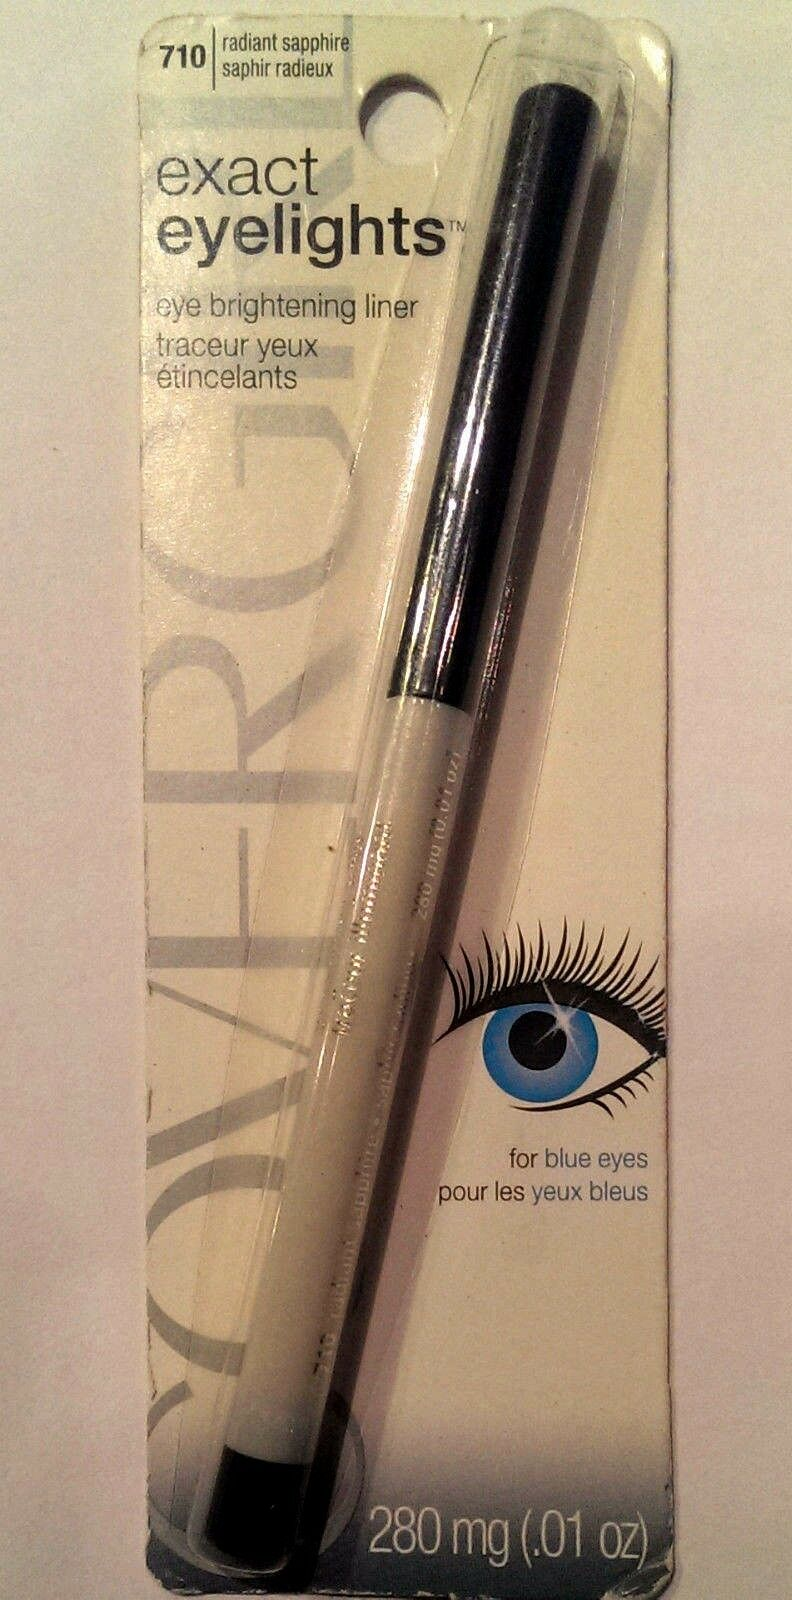 Exact Eyelights Eye Brightening Liner by Covergirl #16